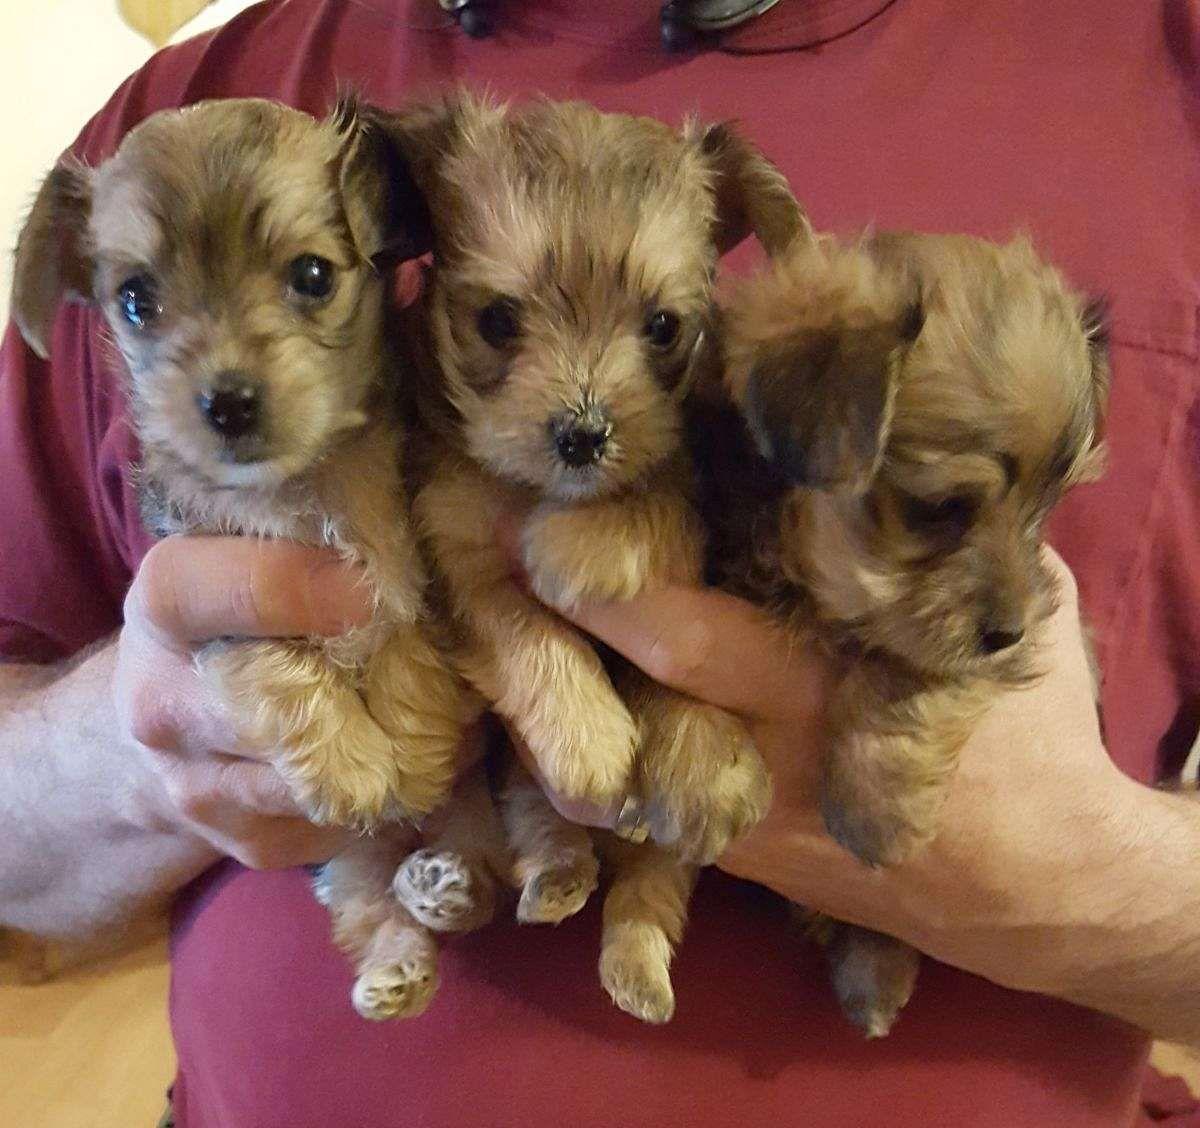 3 4 Yorkie 1 4 Maltese Puppies Yorkshire Terrier Teacup Maltese Puppy Yorkie